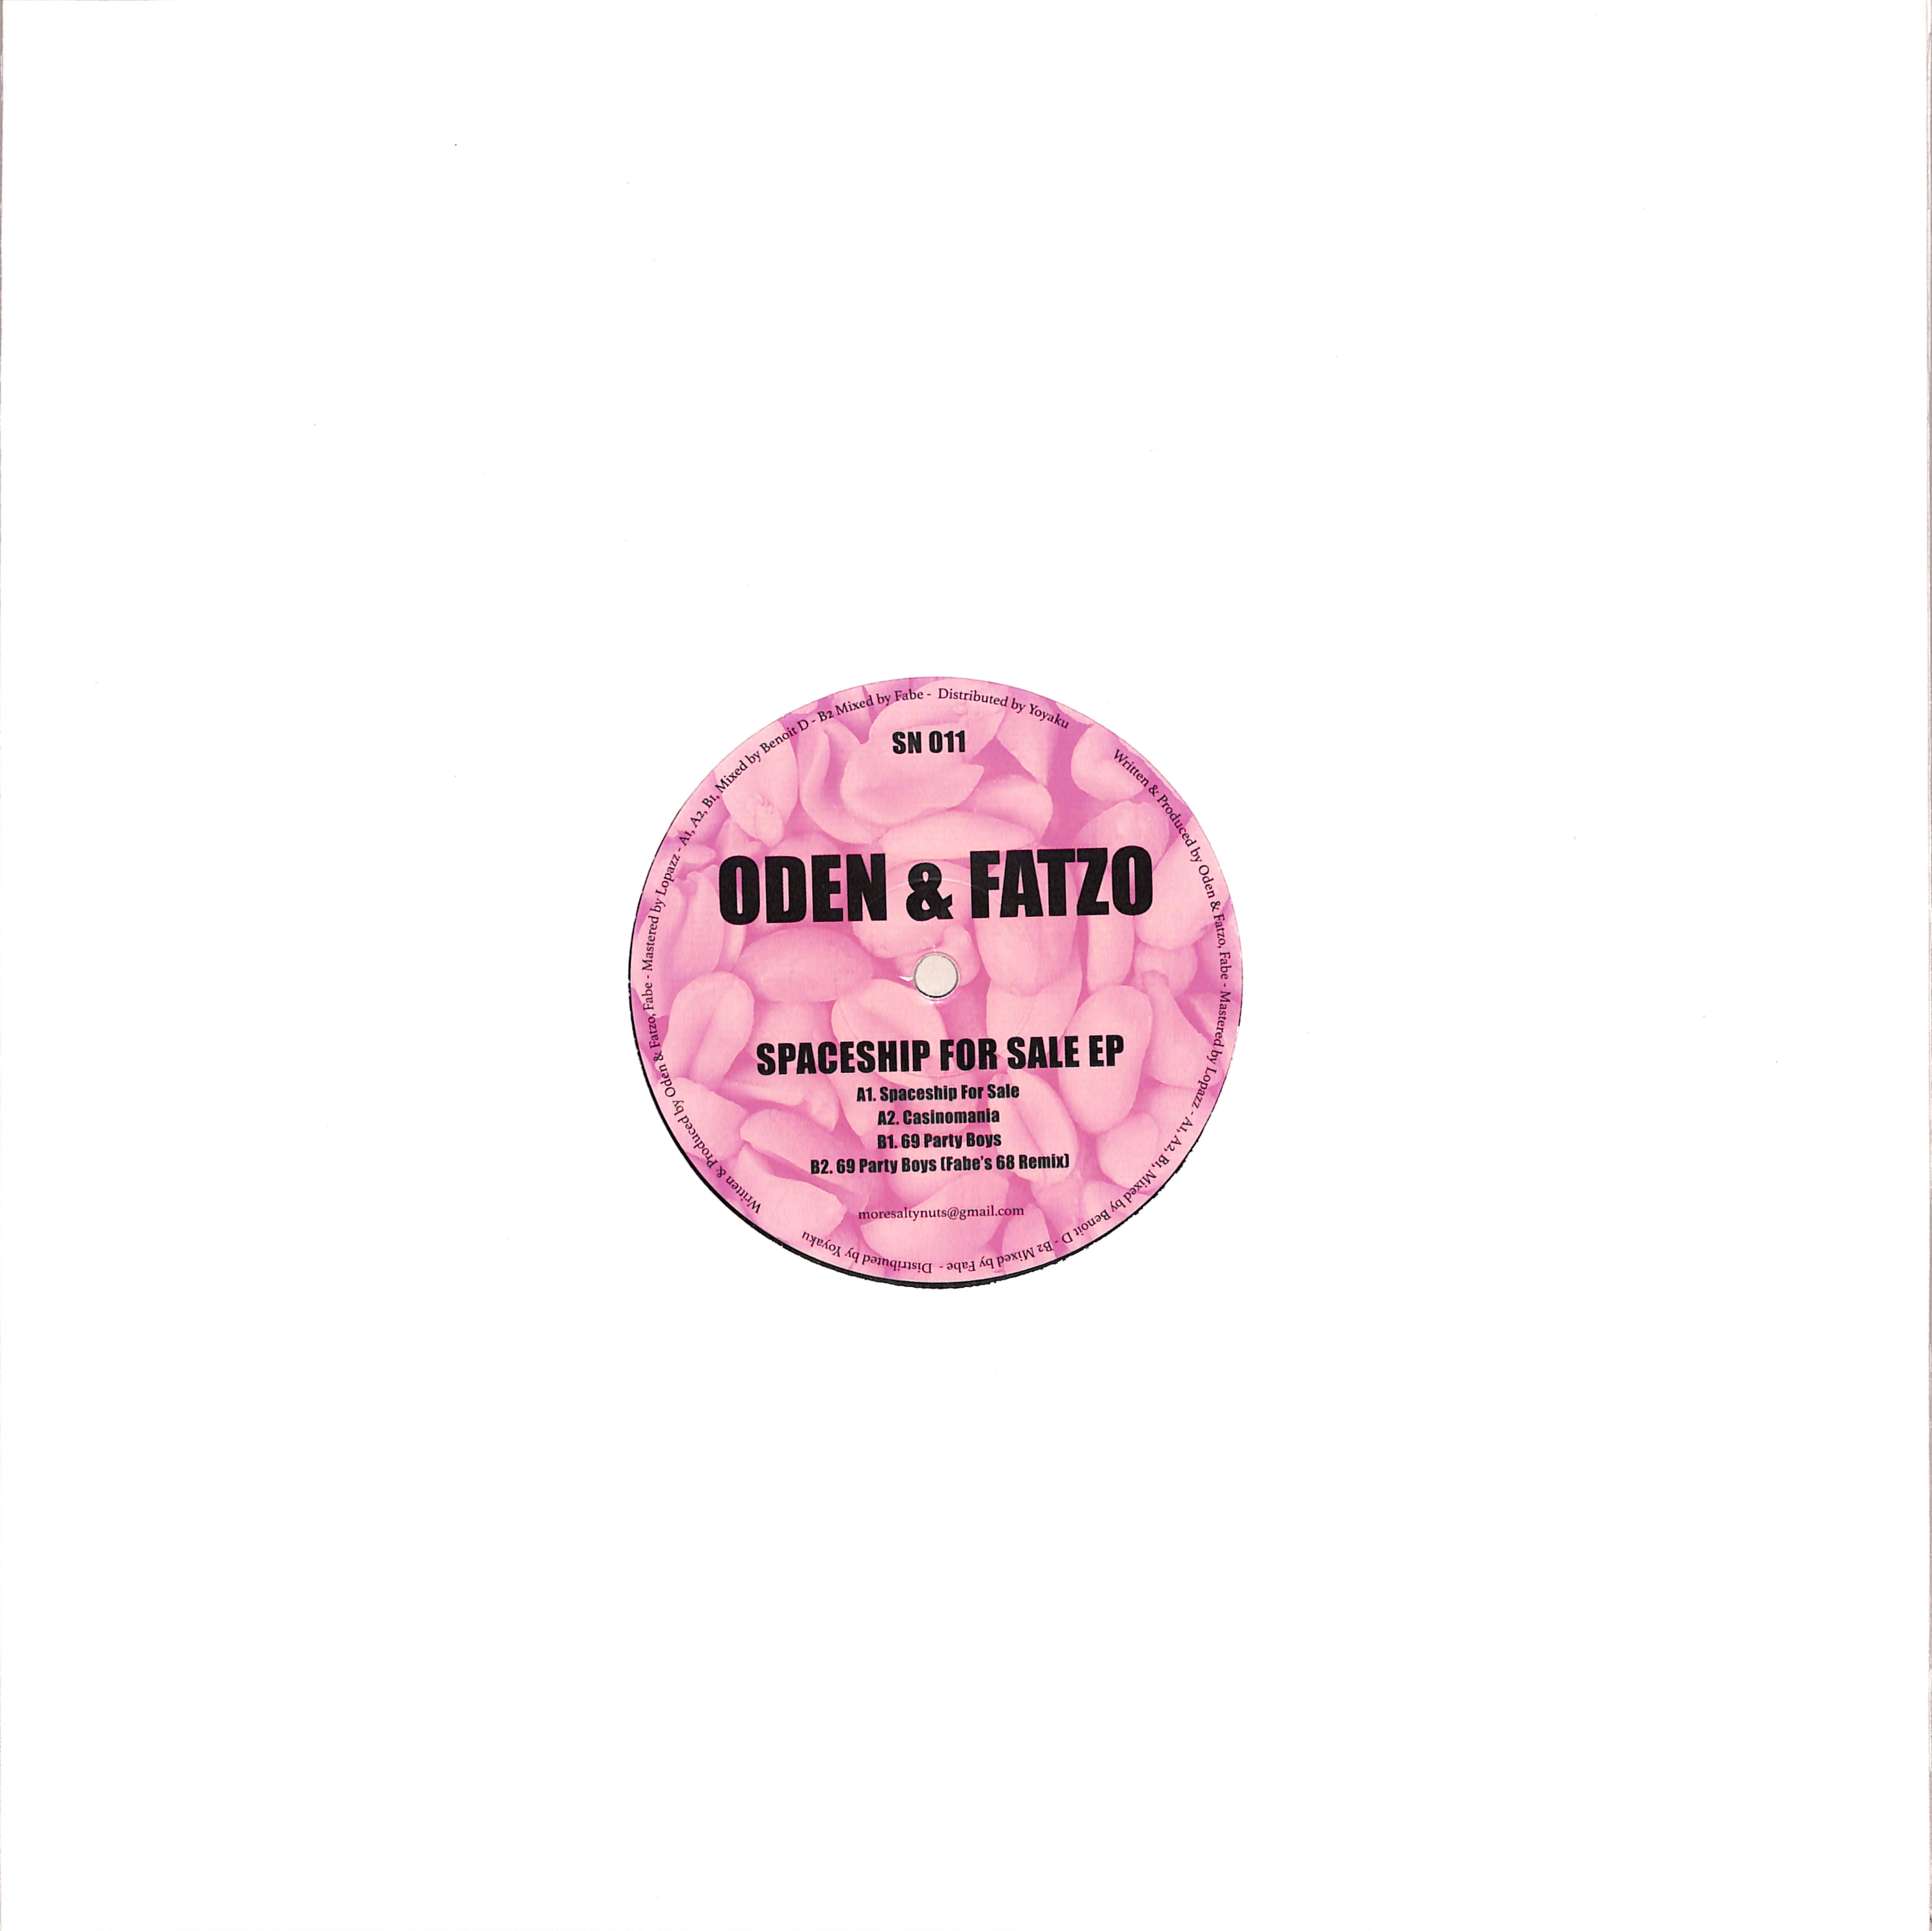 Oden & Fatzo - SPACESHIP FOR SALE EP